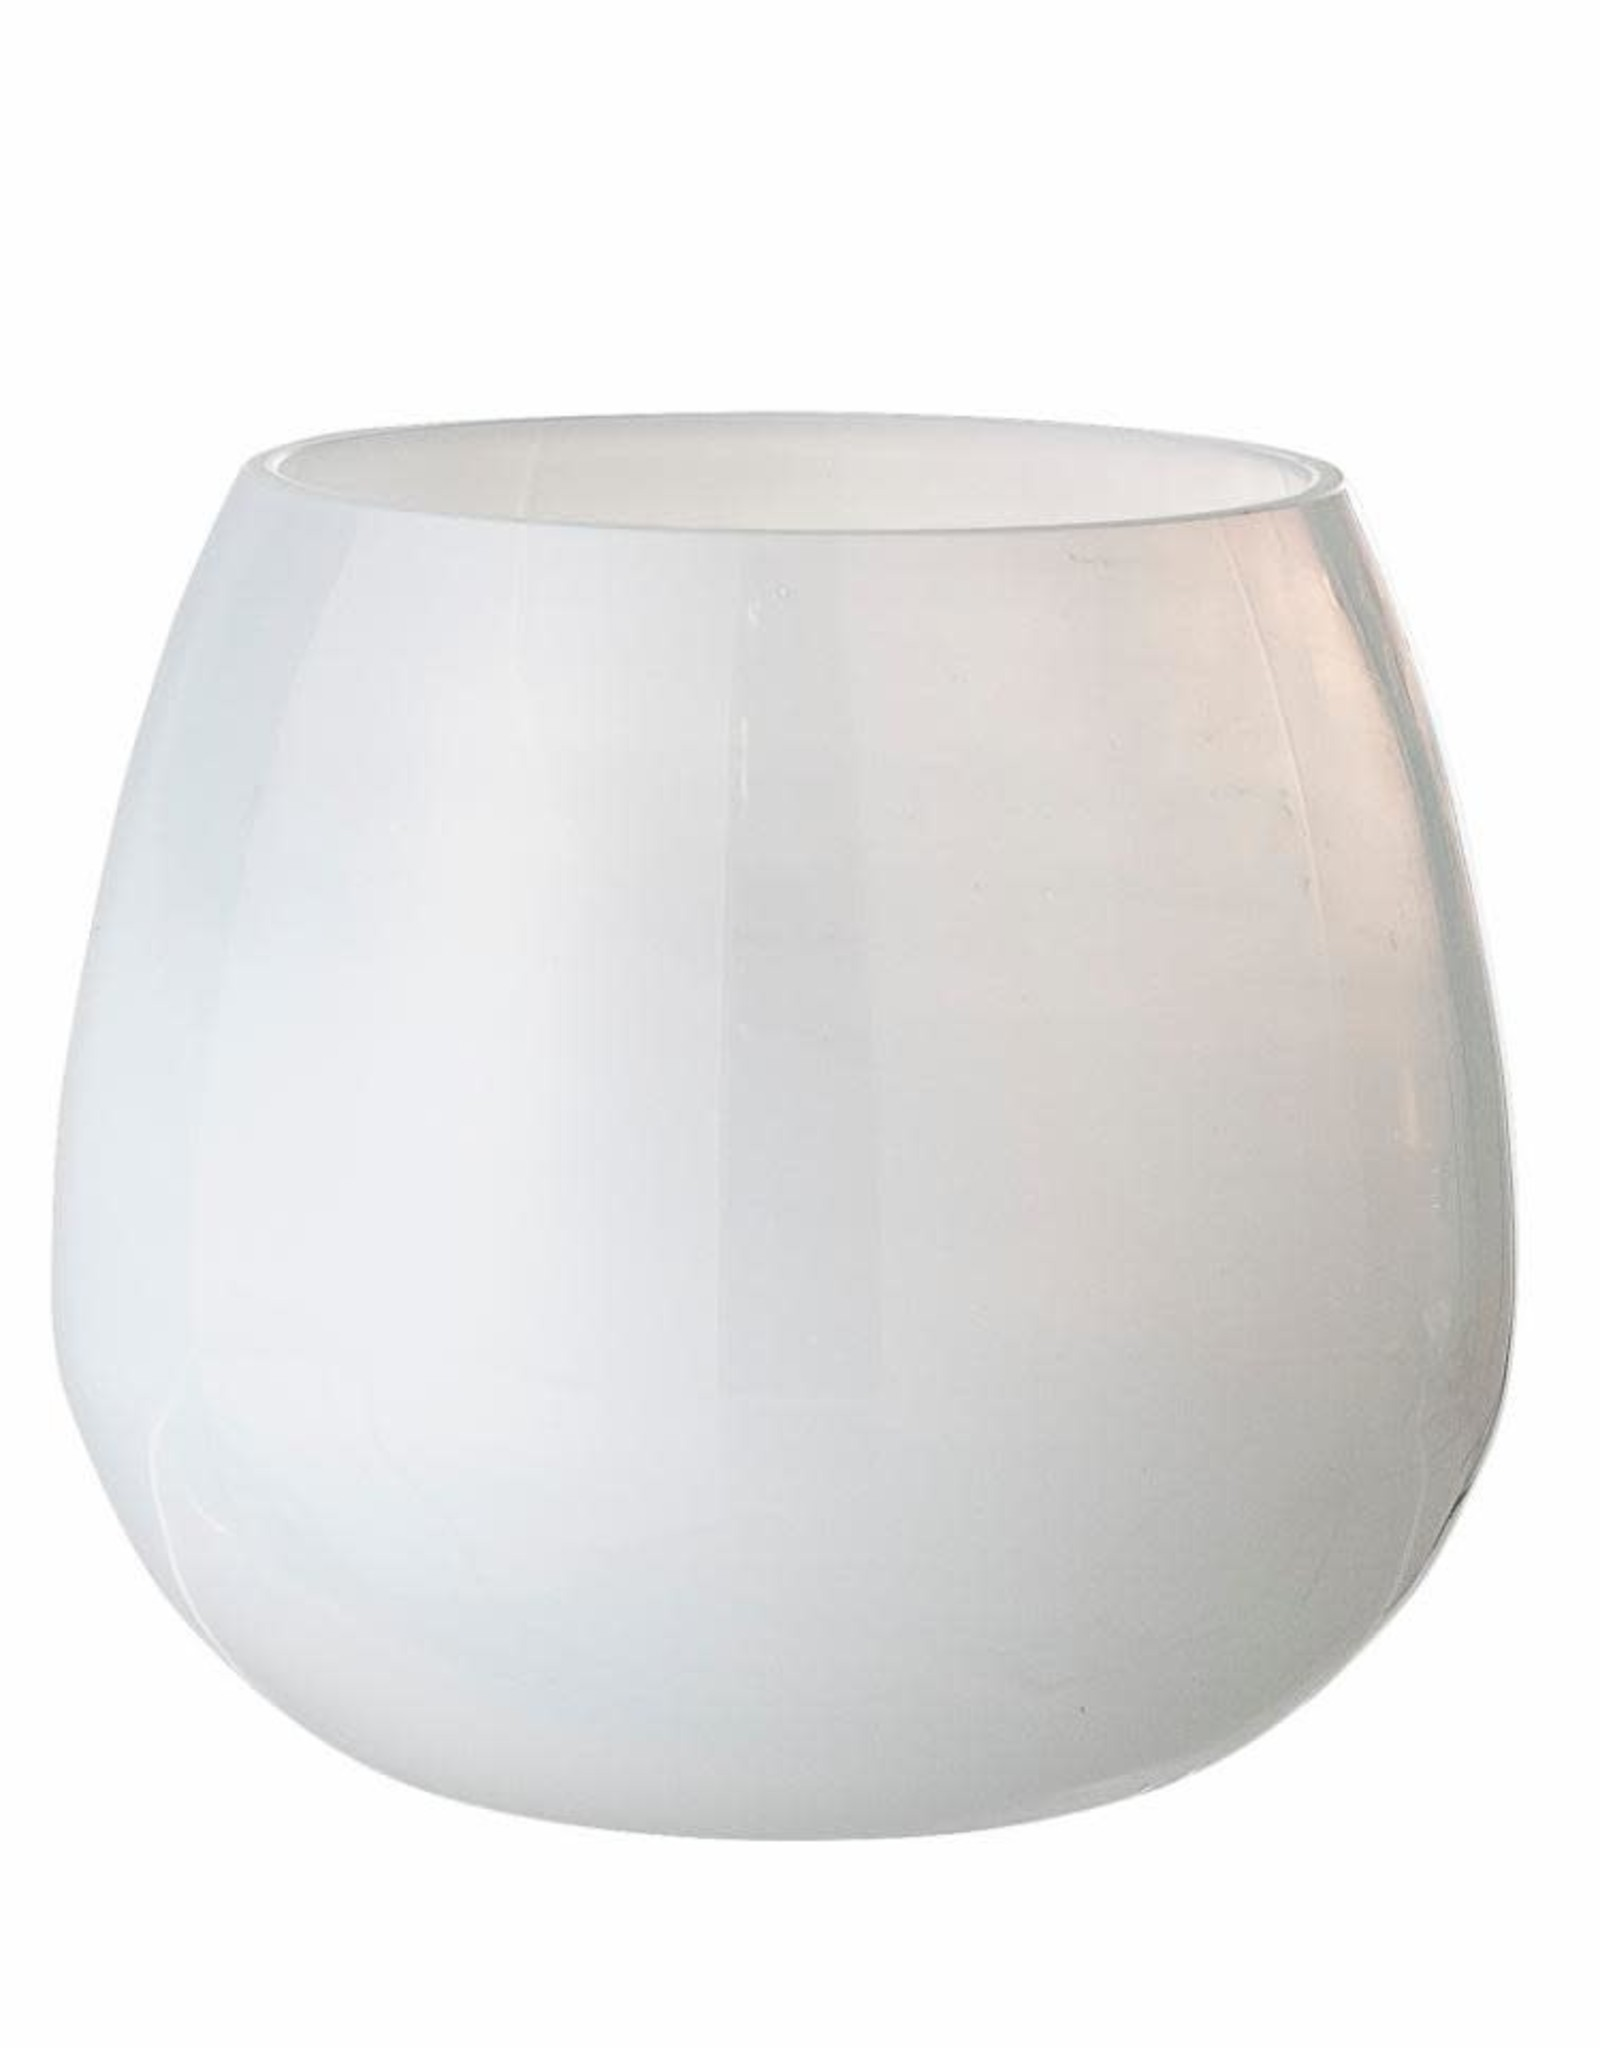 Bloomingville Bloomingville - Karna Votive , White, Recleyd glass